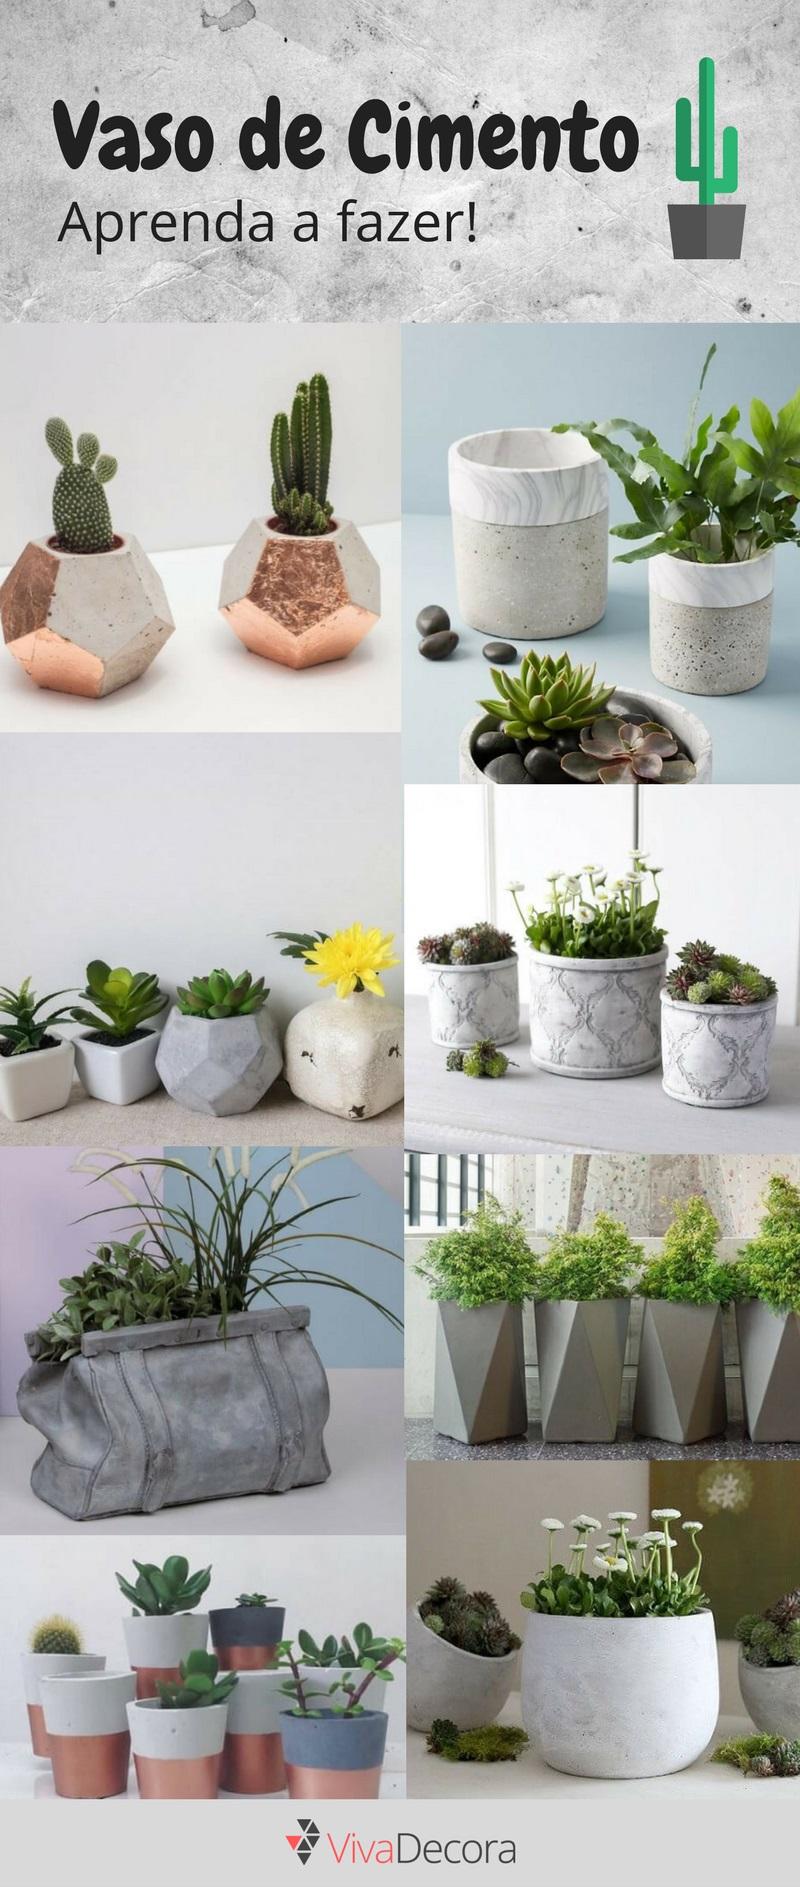 Infográfico - Vaso de Cimento